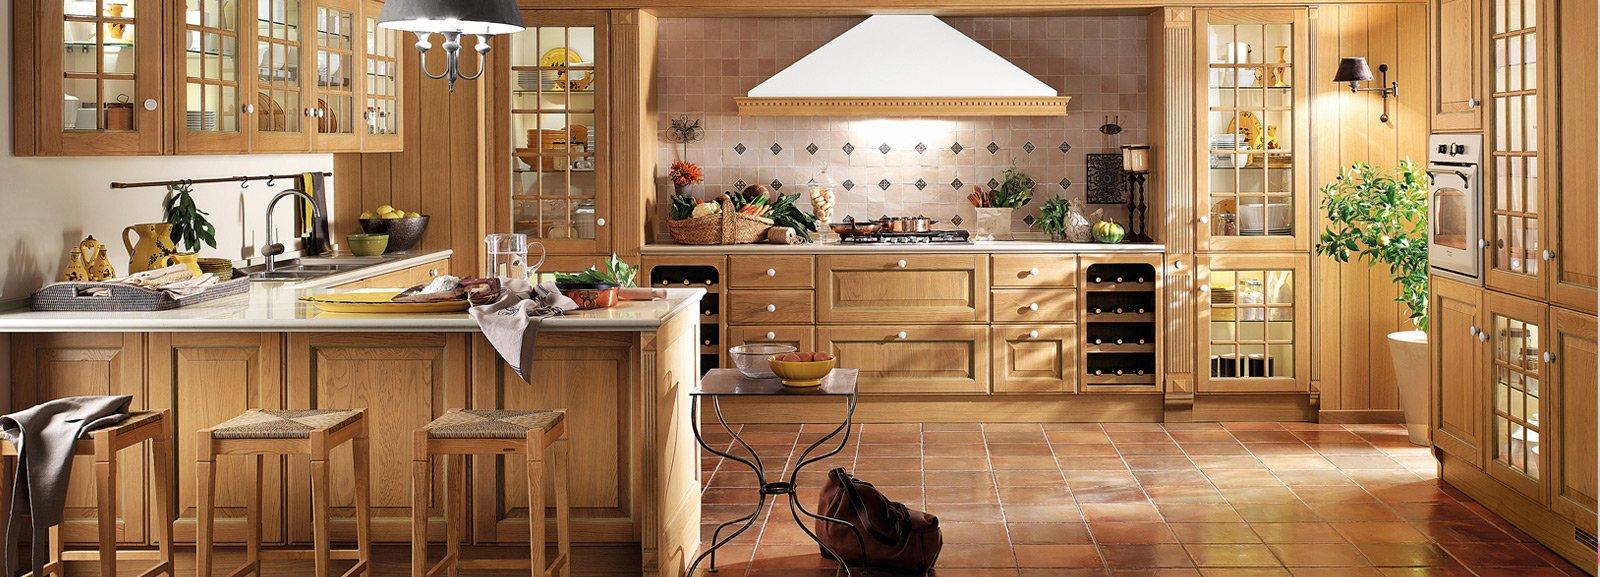 Best Cucine Dada Opinioni Images - getfitamerica.us - getfitamerica.us